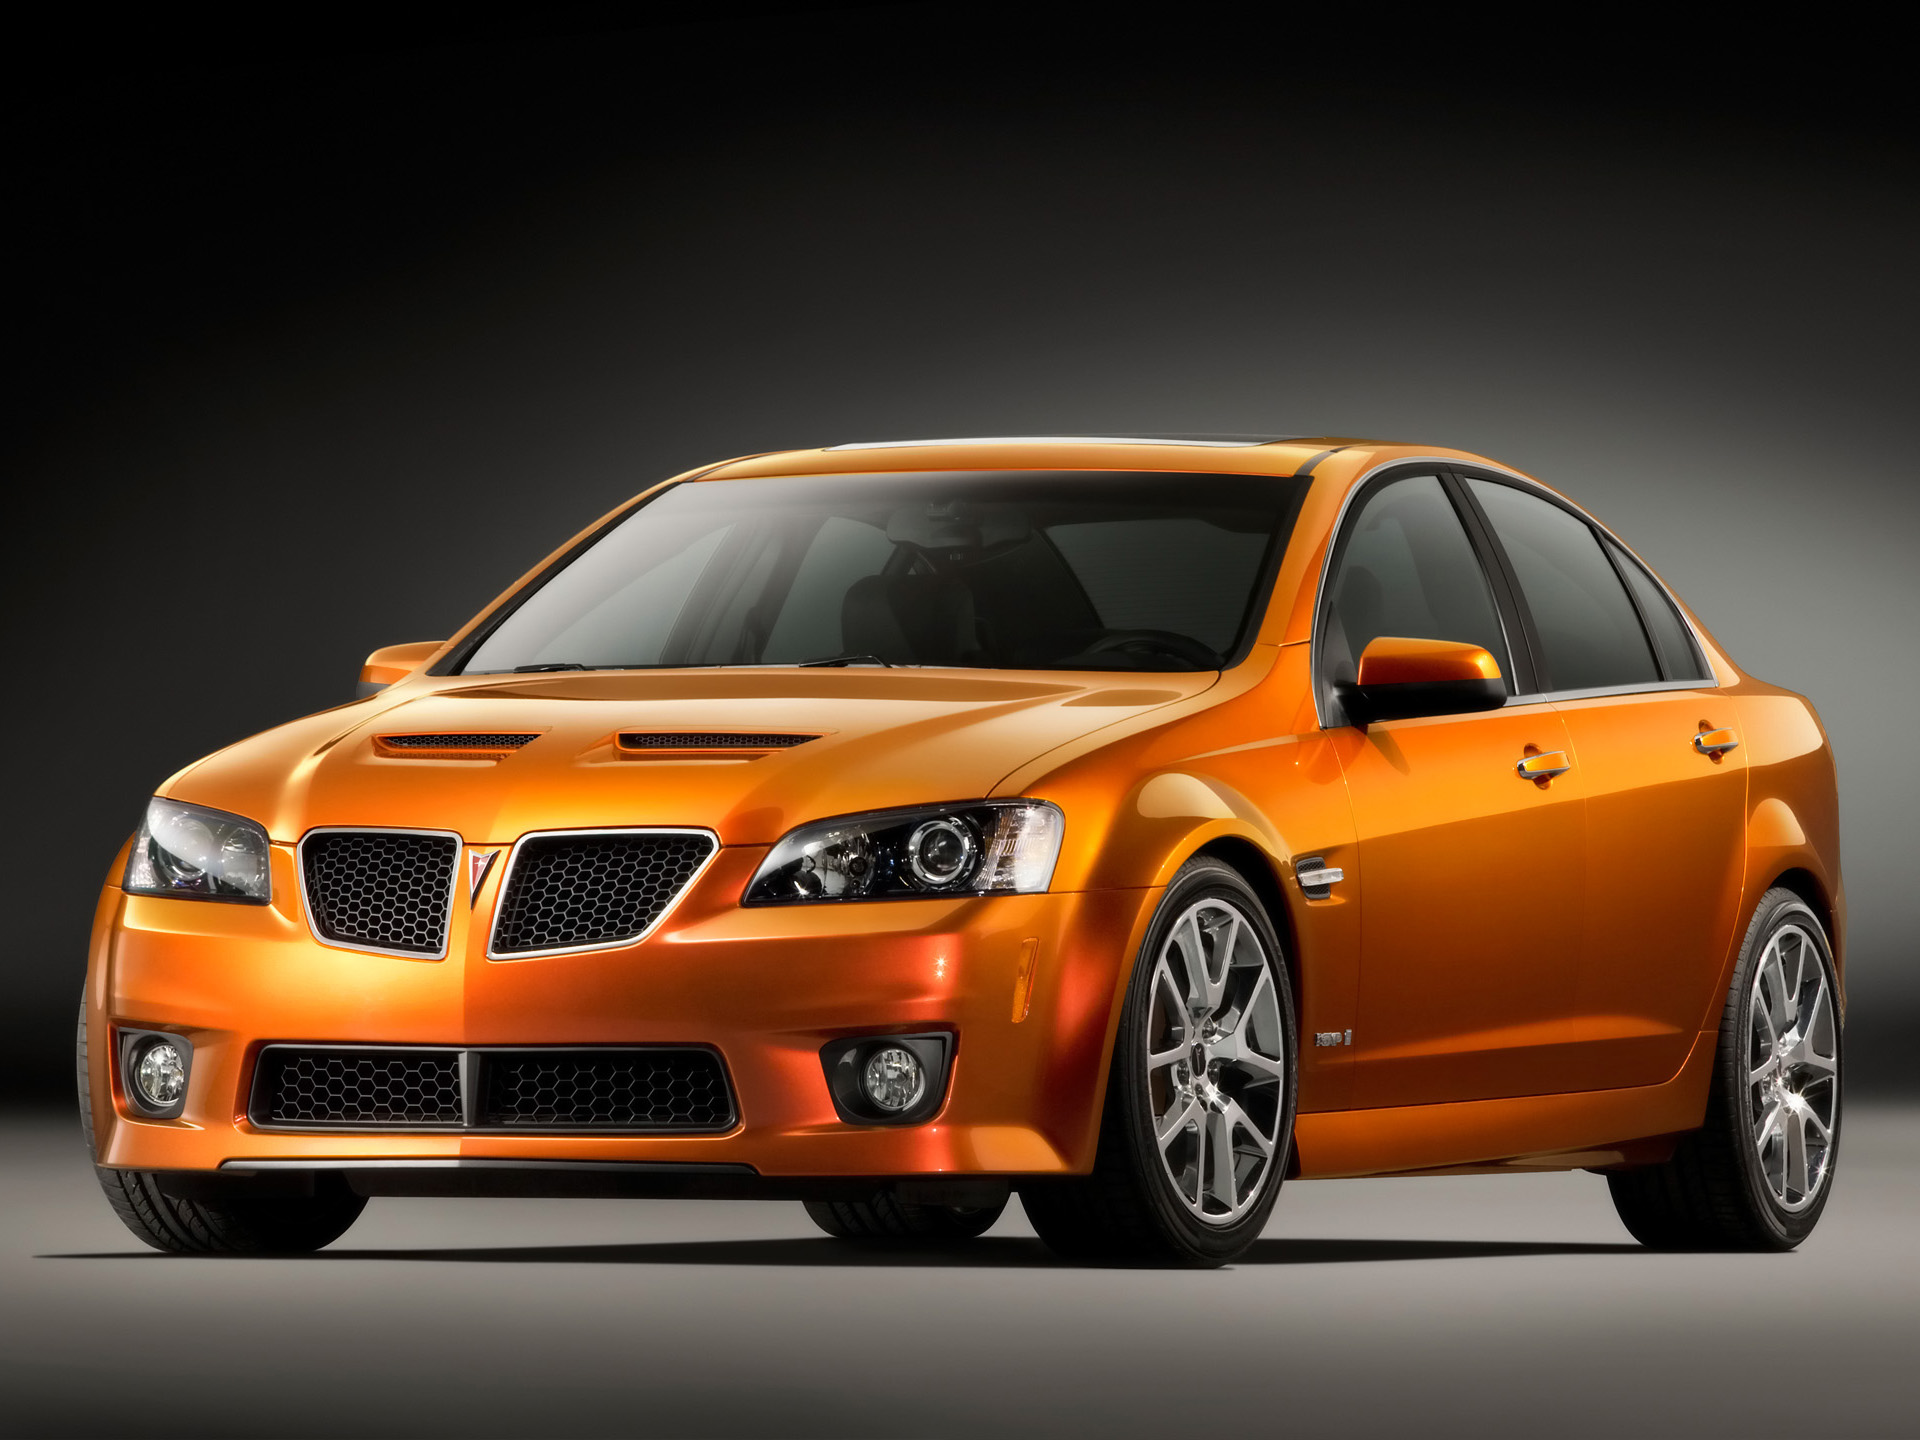 2009 Pontiac G8 GXP. X09PN_G8004 (United States)